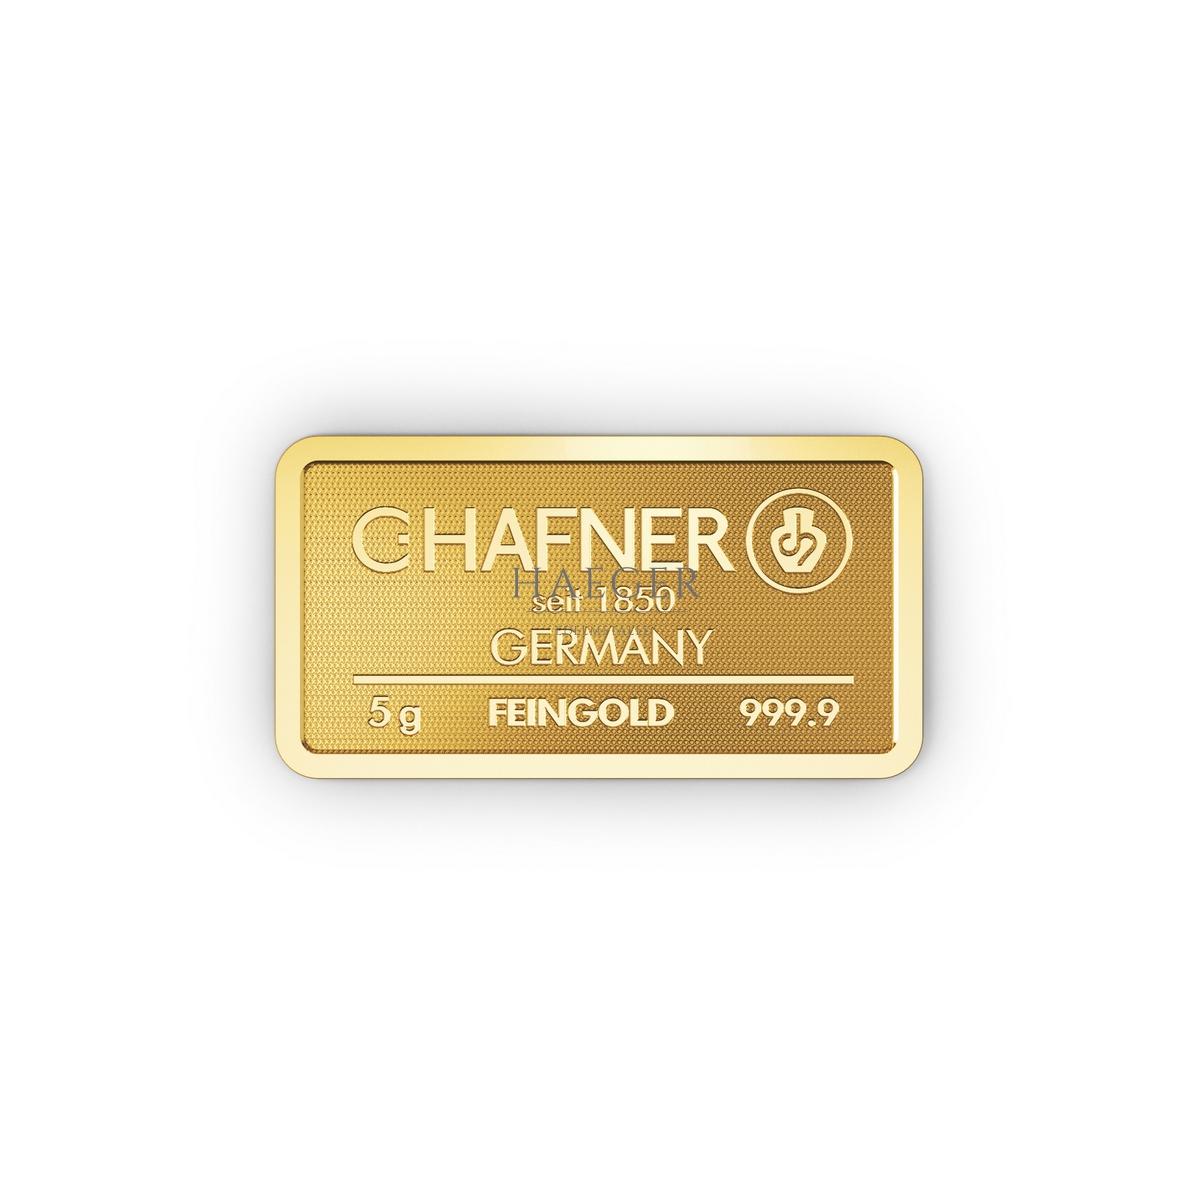 5g Goldbarren Hafner c